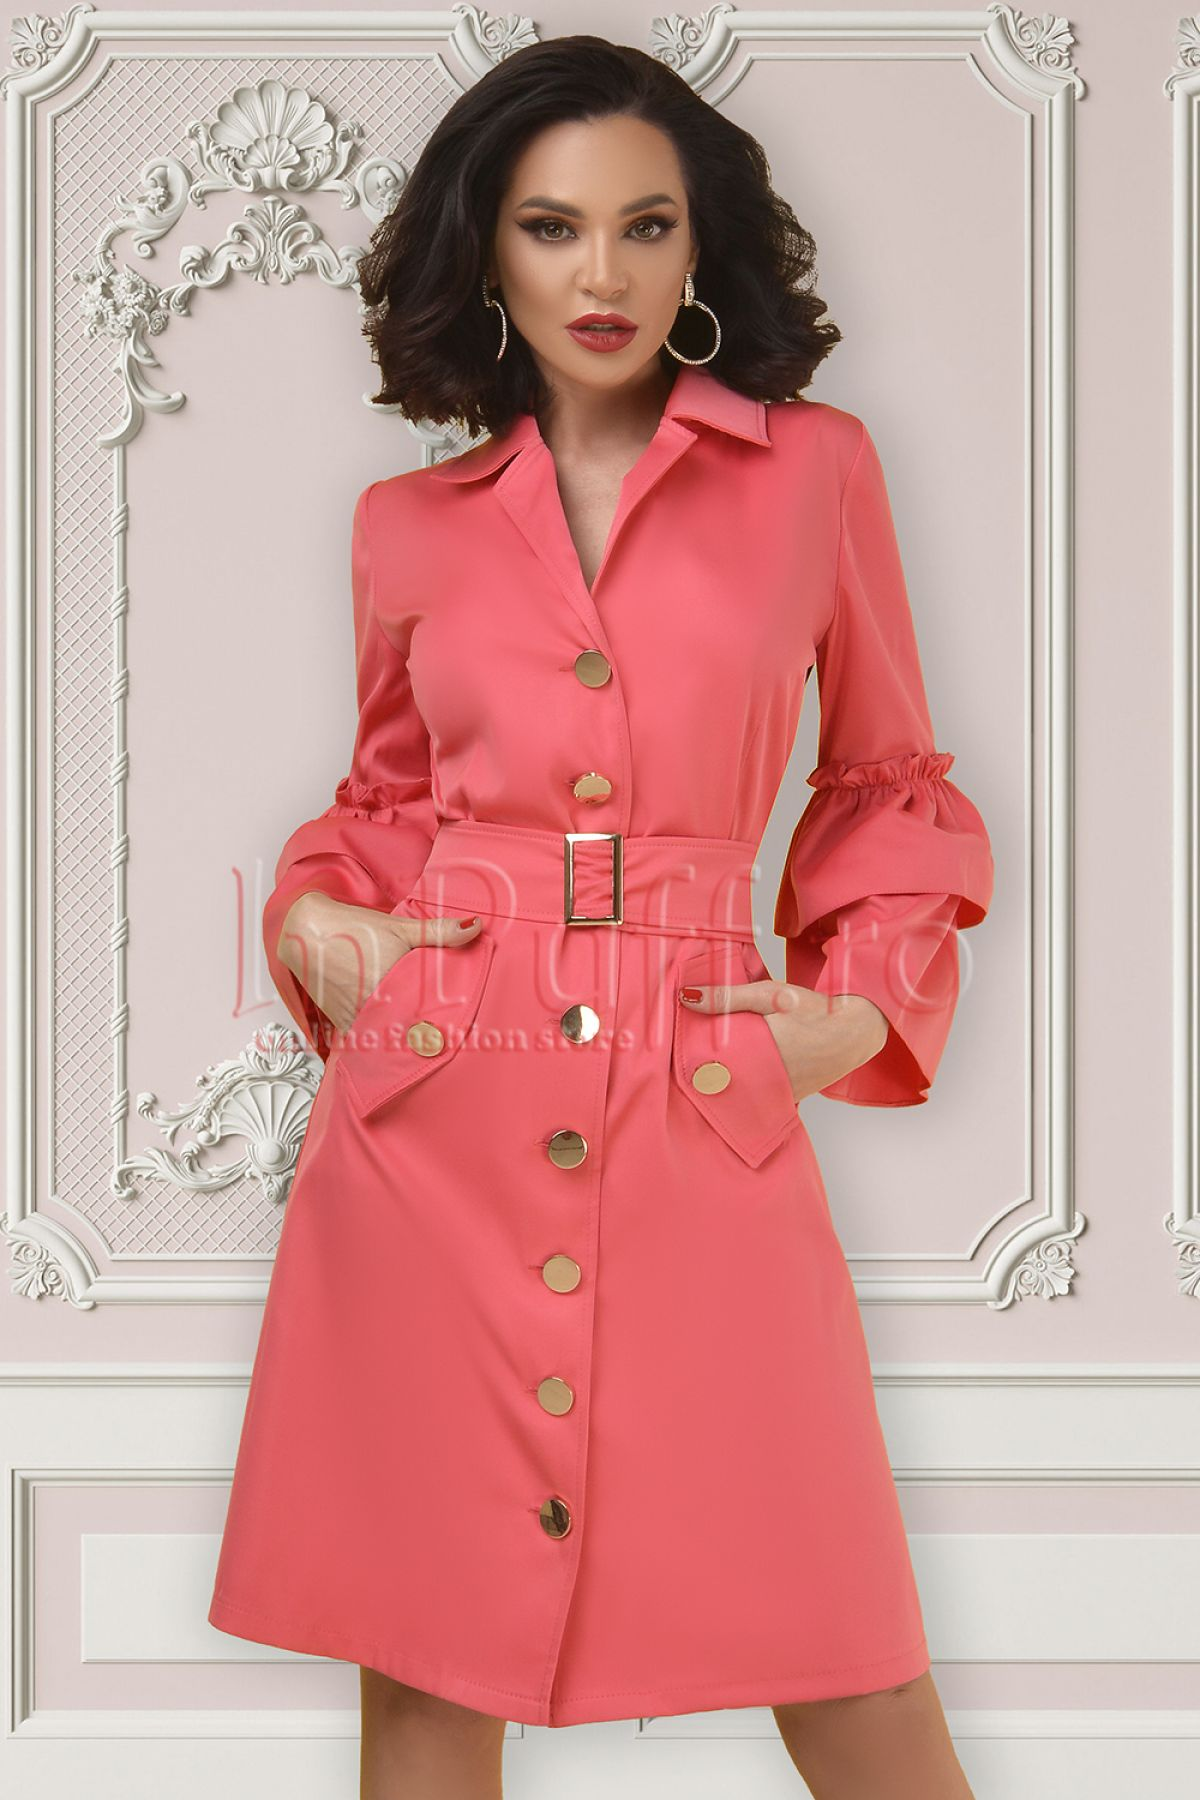 Rochie tip camasa Atmosphere roz cu maneci clopot Atmosphere